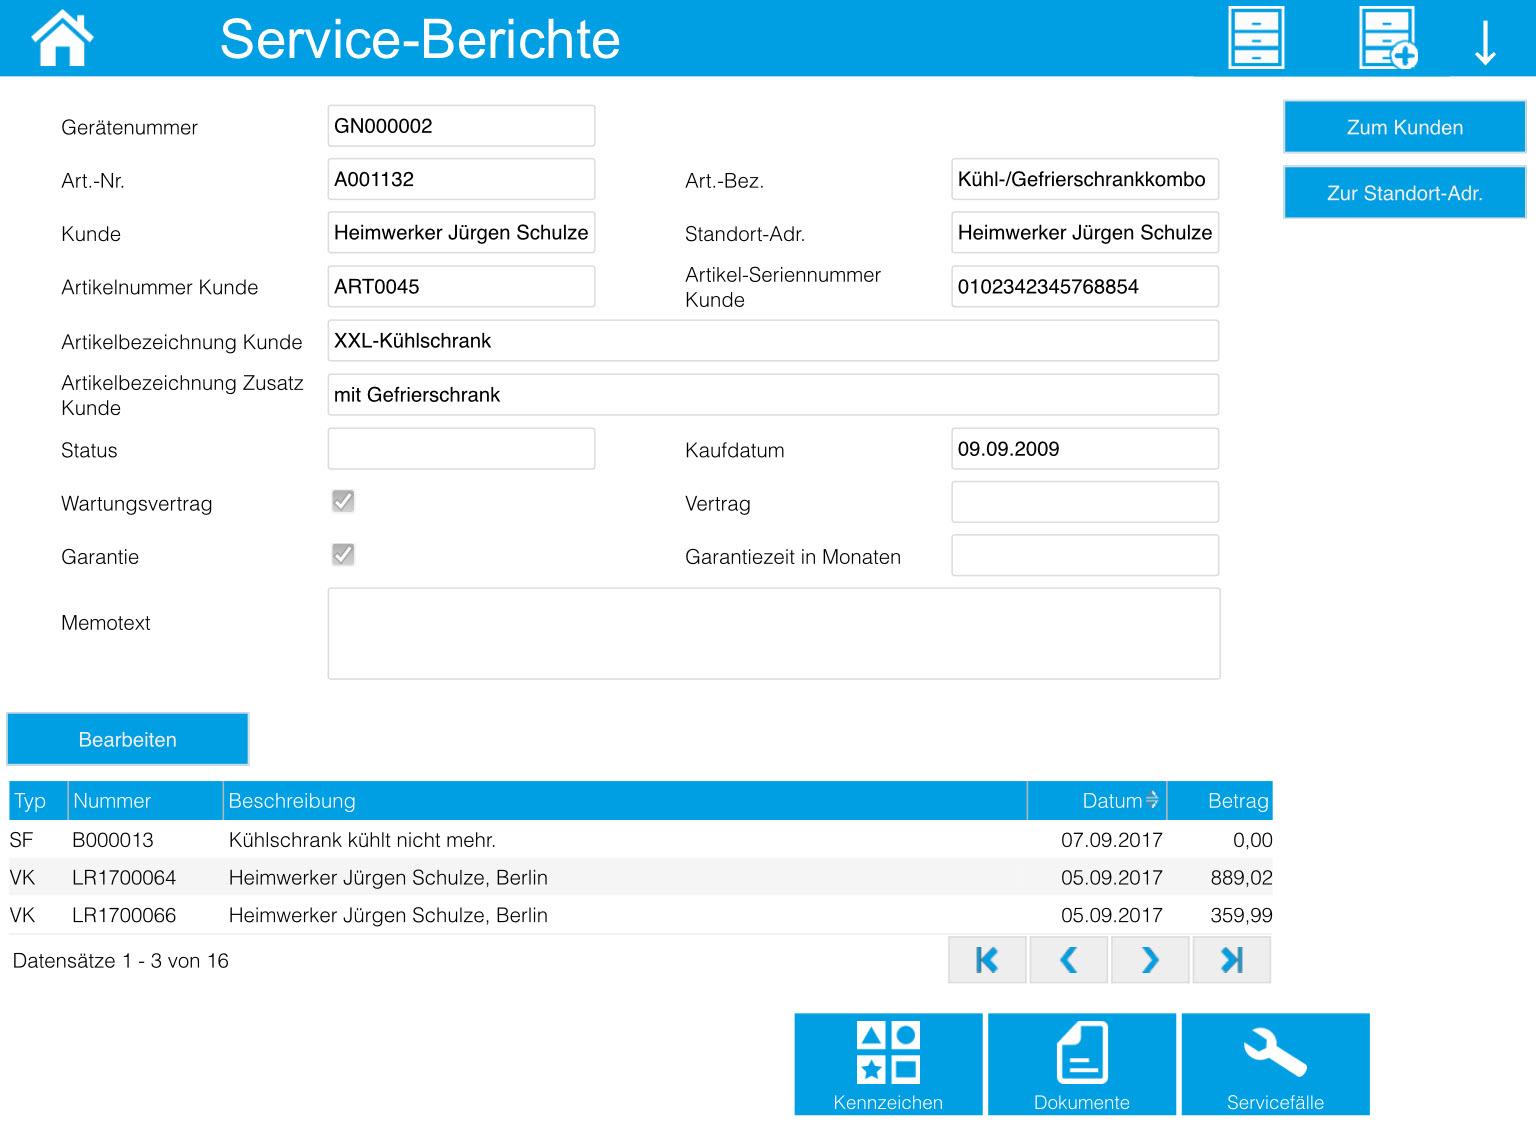 Service-Berichte 6